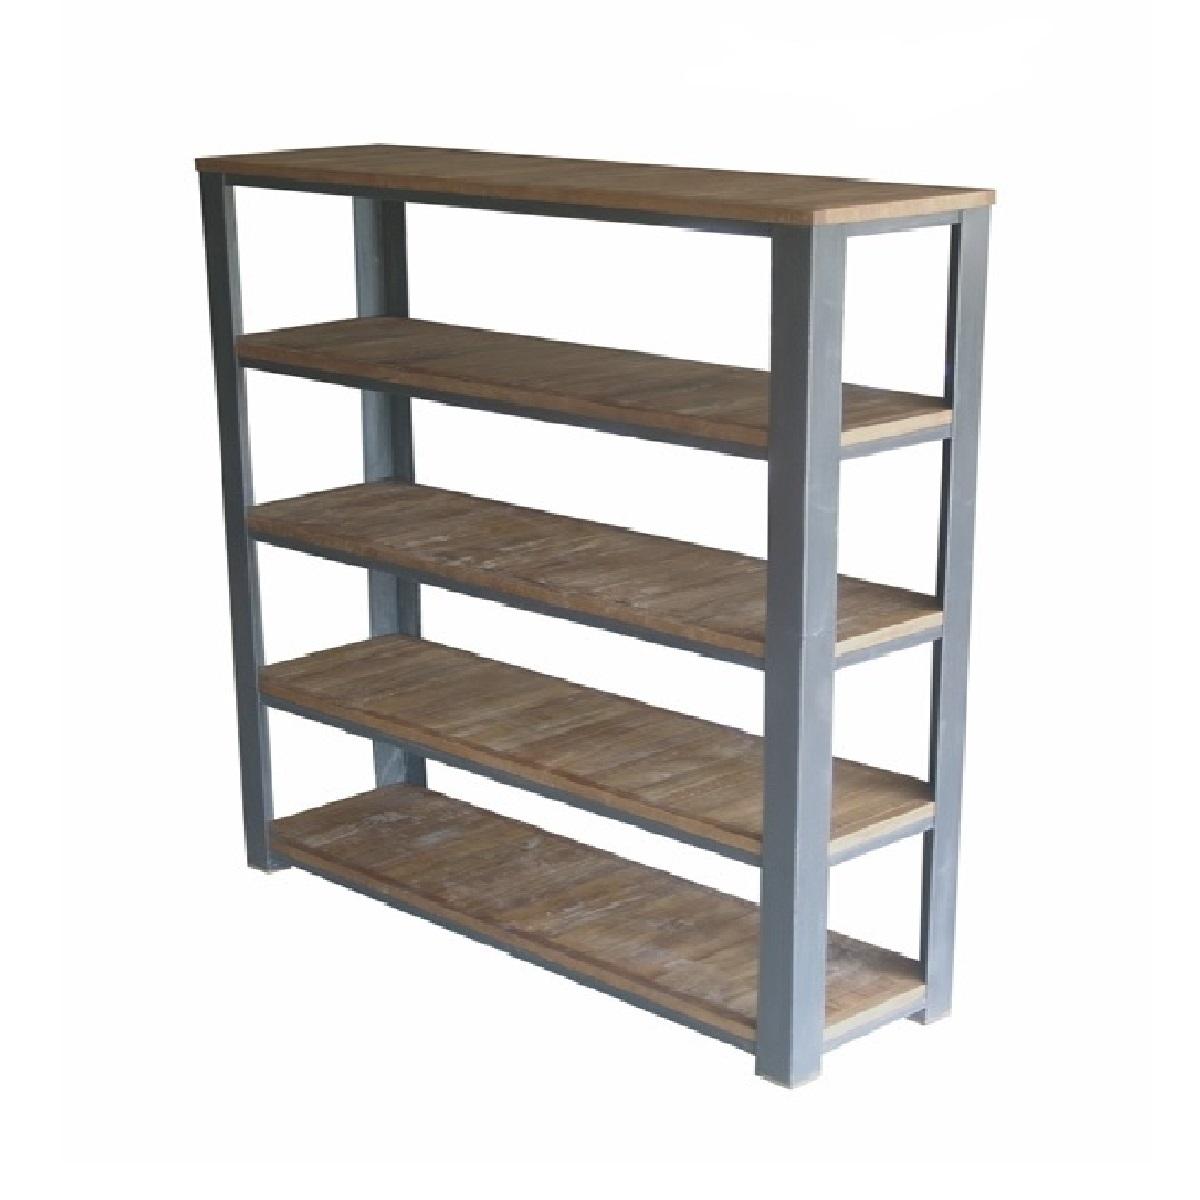 Shelving / Storage